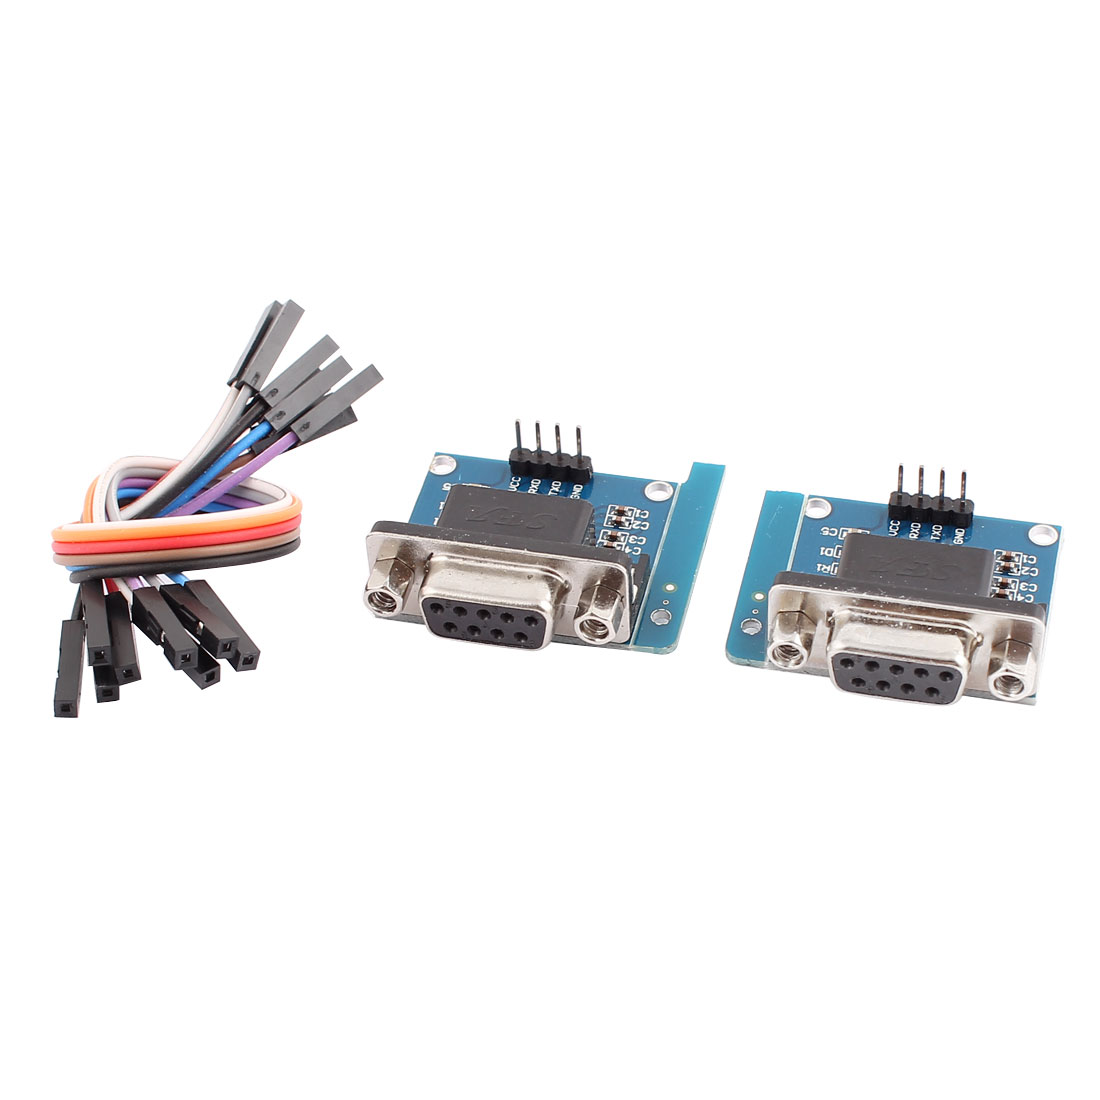 2 Pcs RS232 Serial Port to TTL Converter Transfer Module 2.0